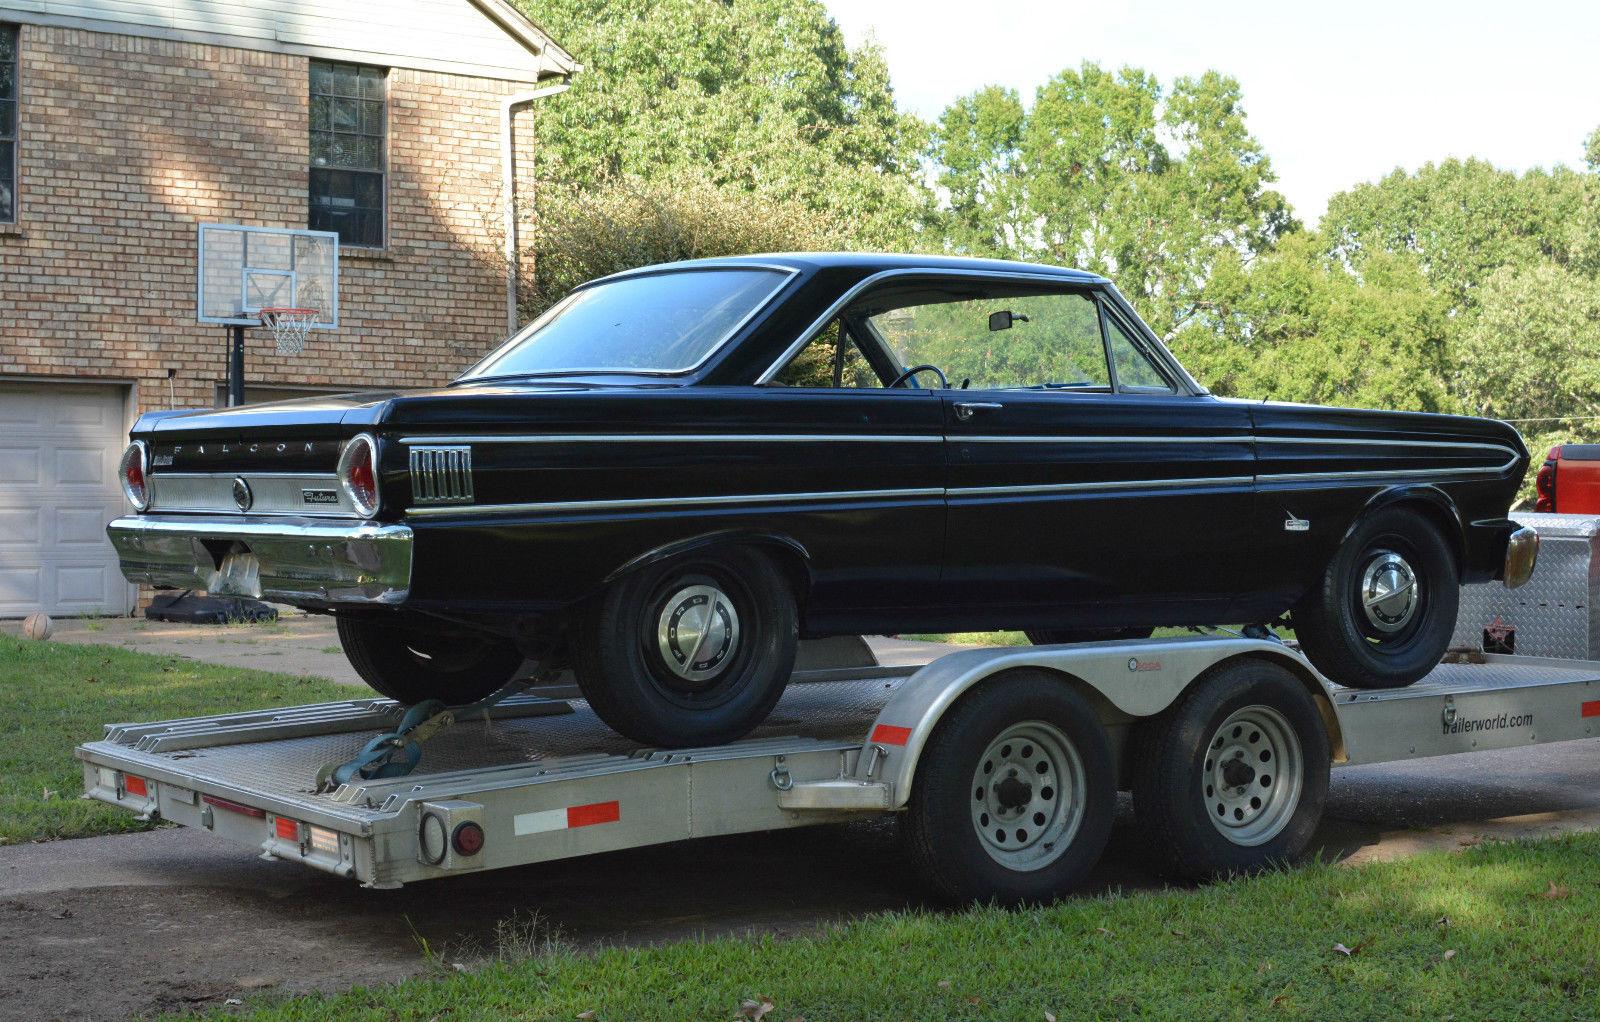 Daily Turismo Tow It Home 1964 Ford Falcon Futura Hardtop